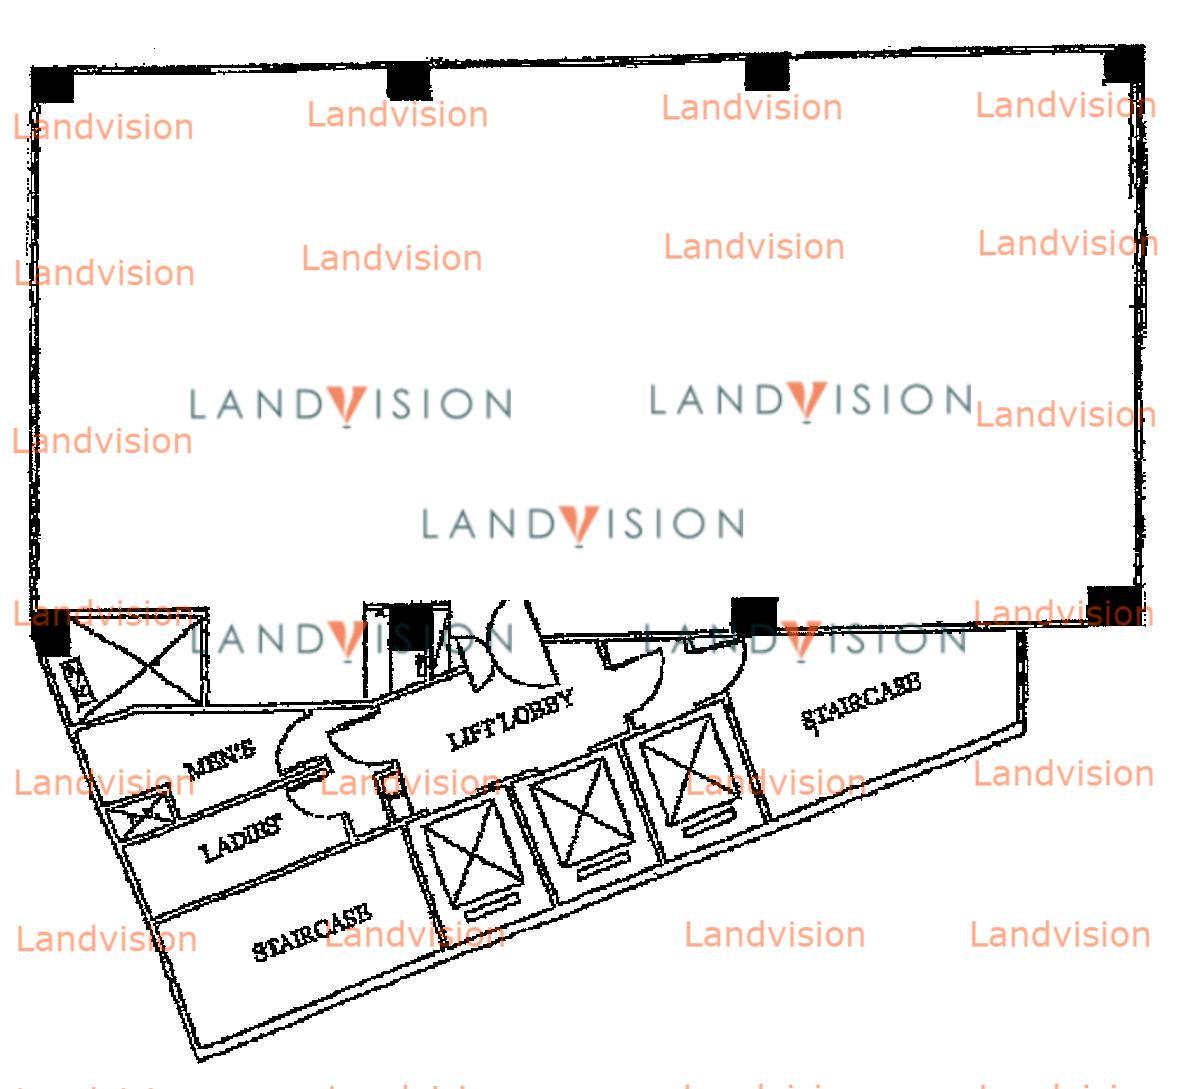 https://www.landvision.com.hk/wp-content/uploads/website/resize/floorplans/000004.JPG